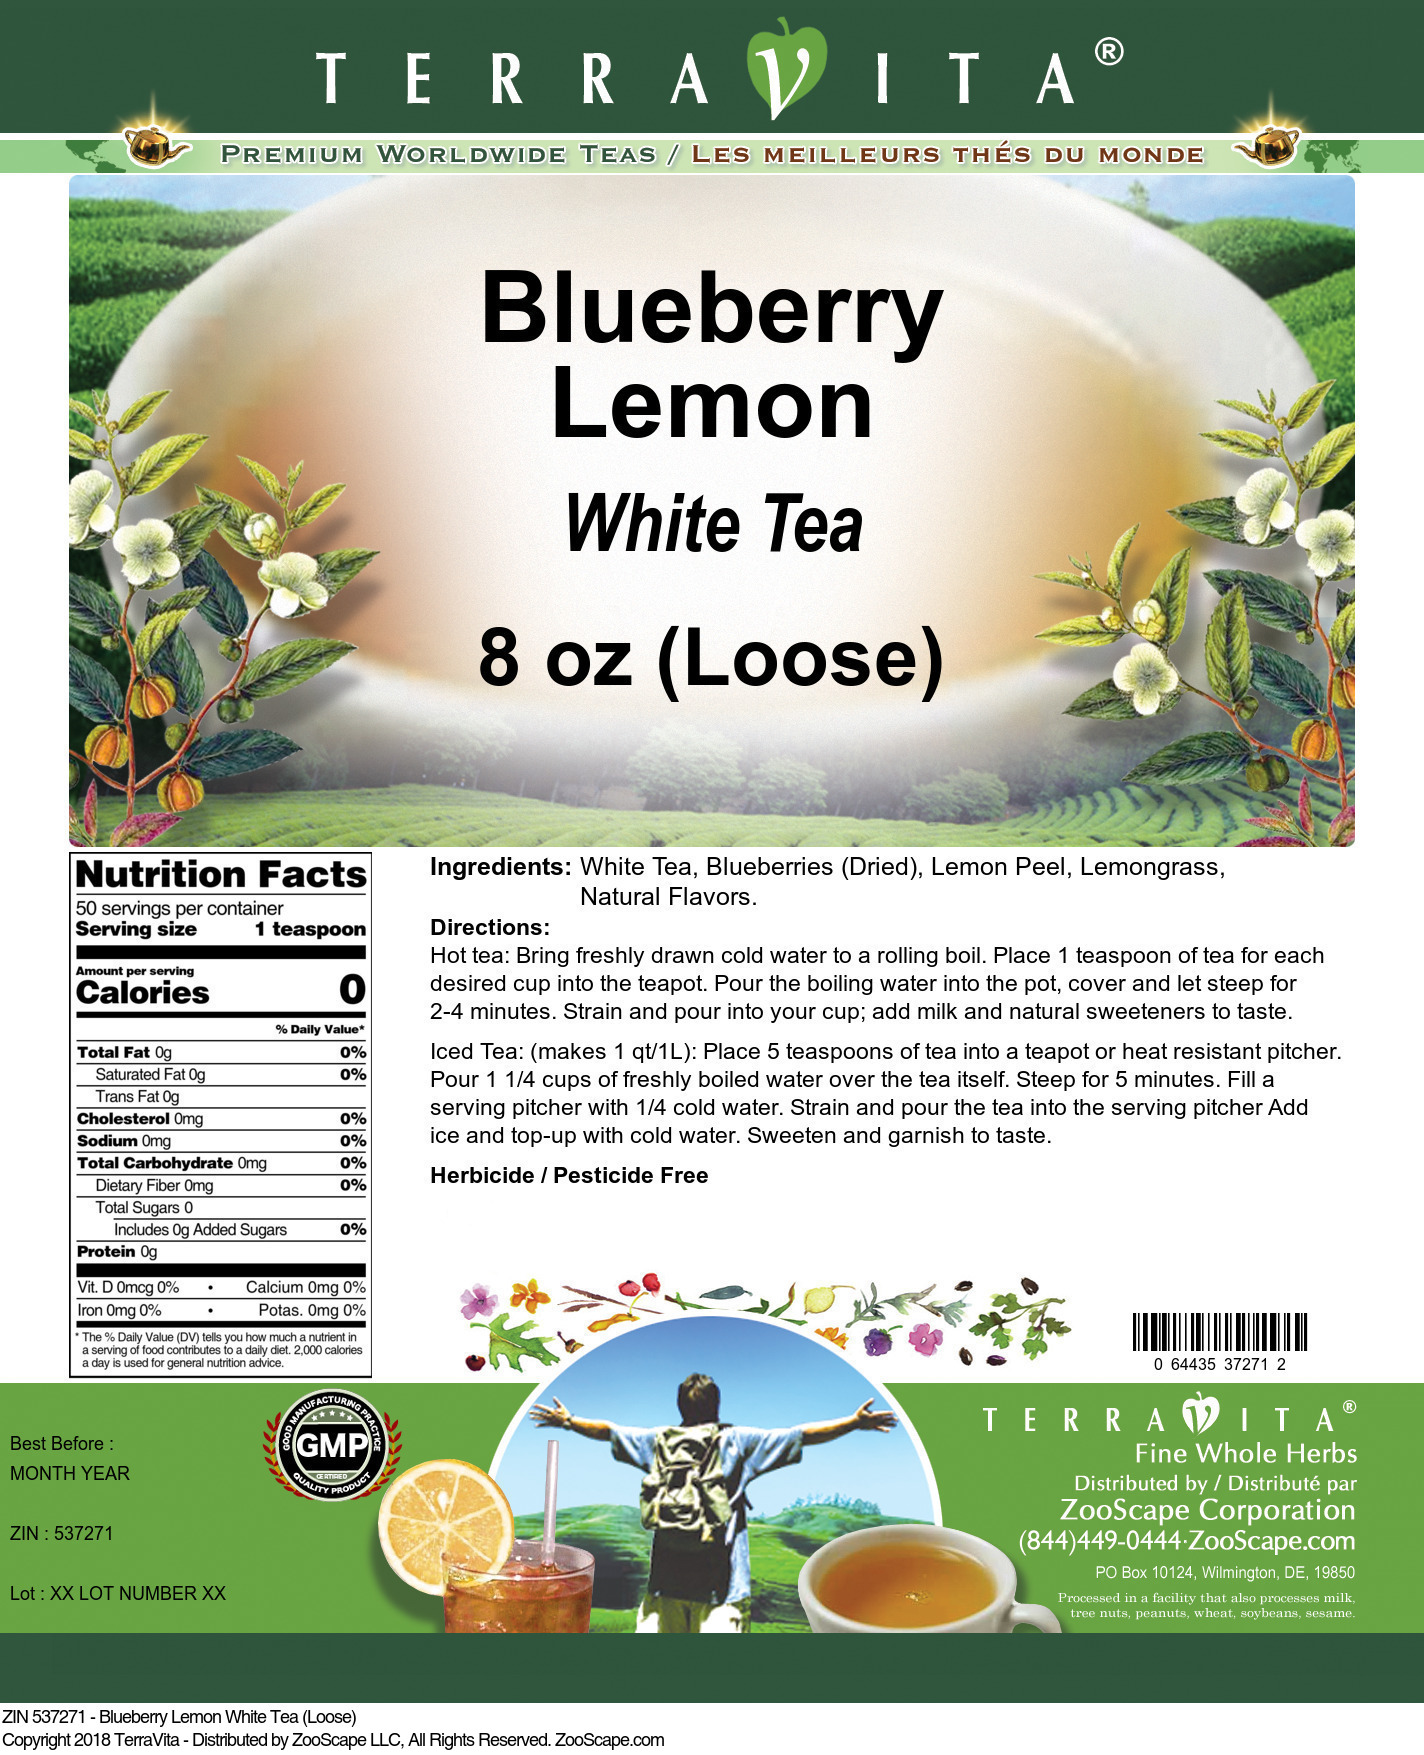 Blueberry Lemon White Tea (Loose)